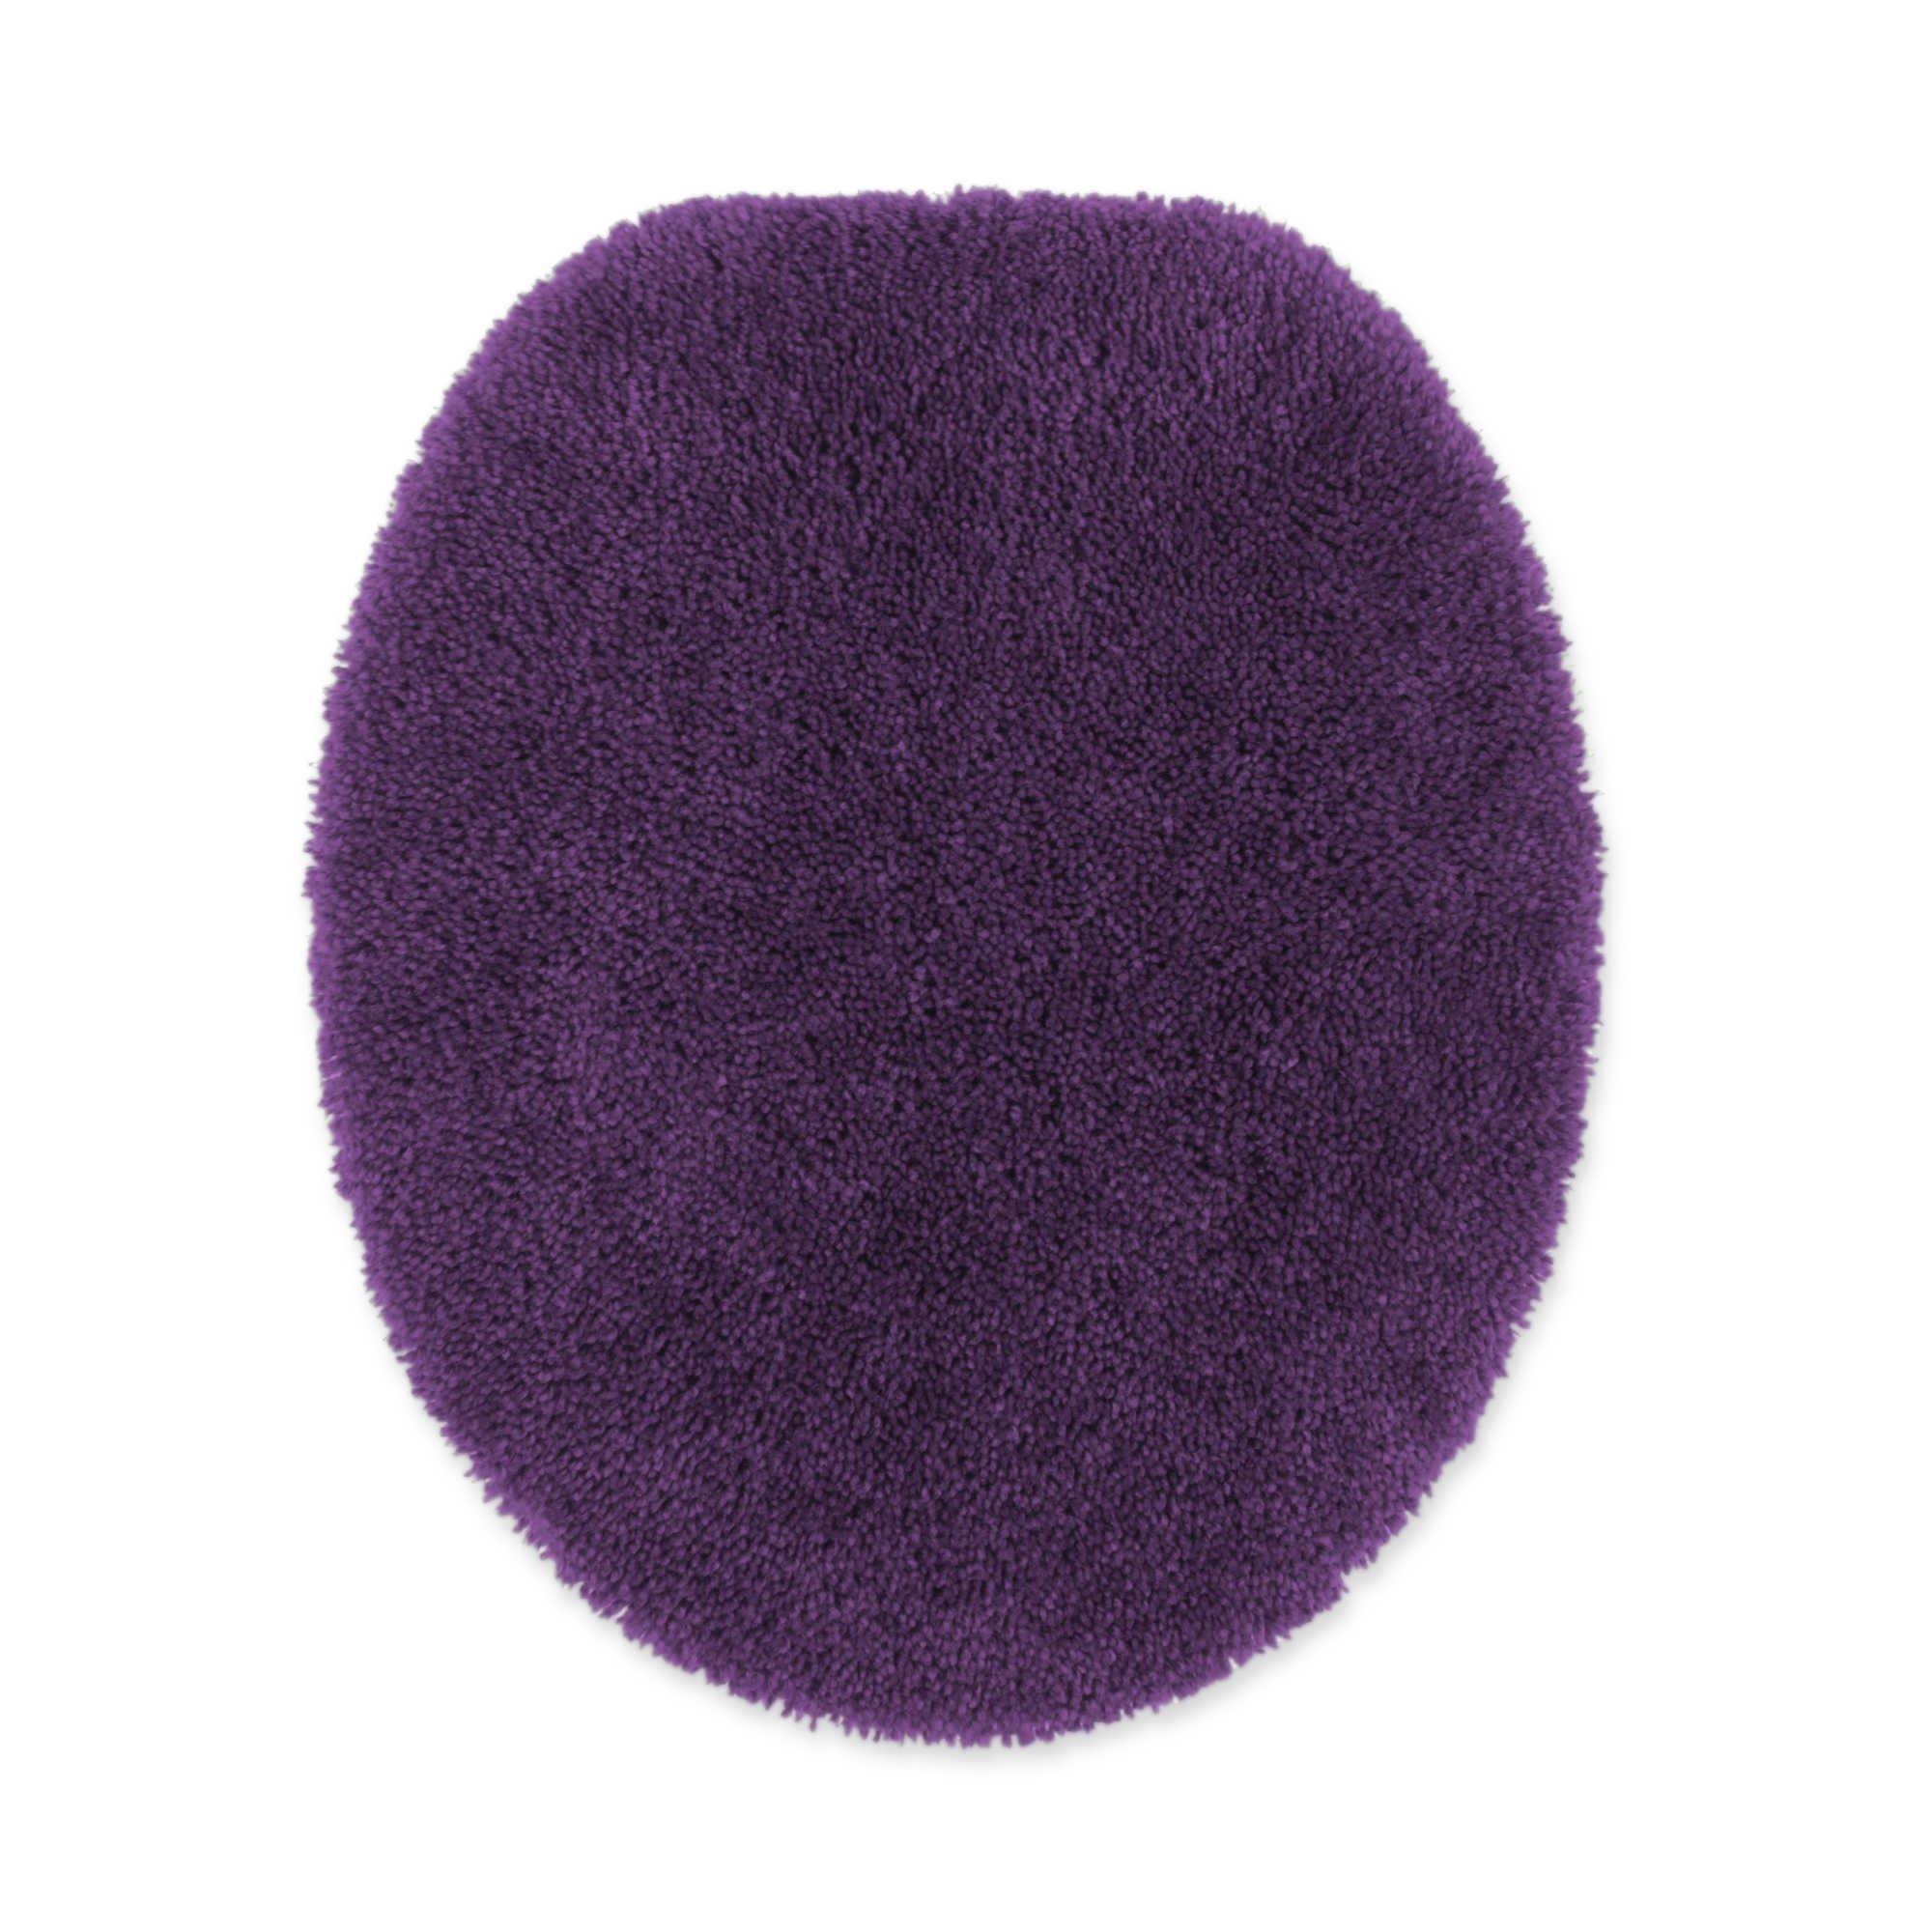 Wamsutta Duet Elongated Toilet Lid Cover in Iris